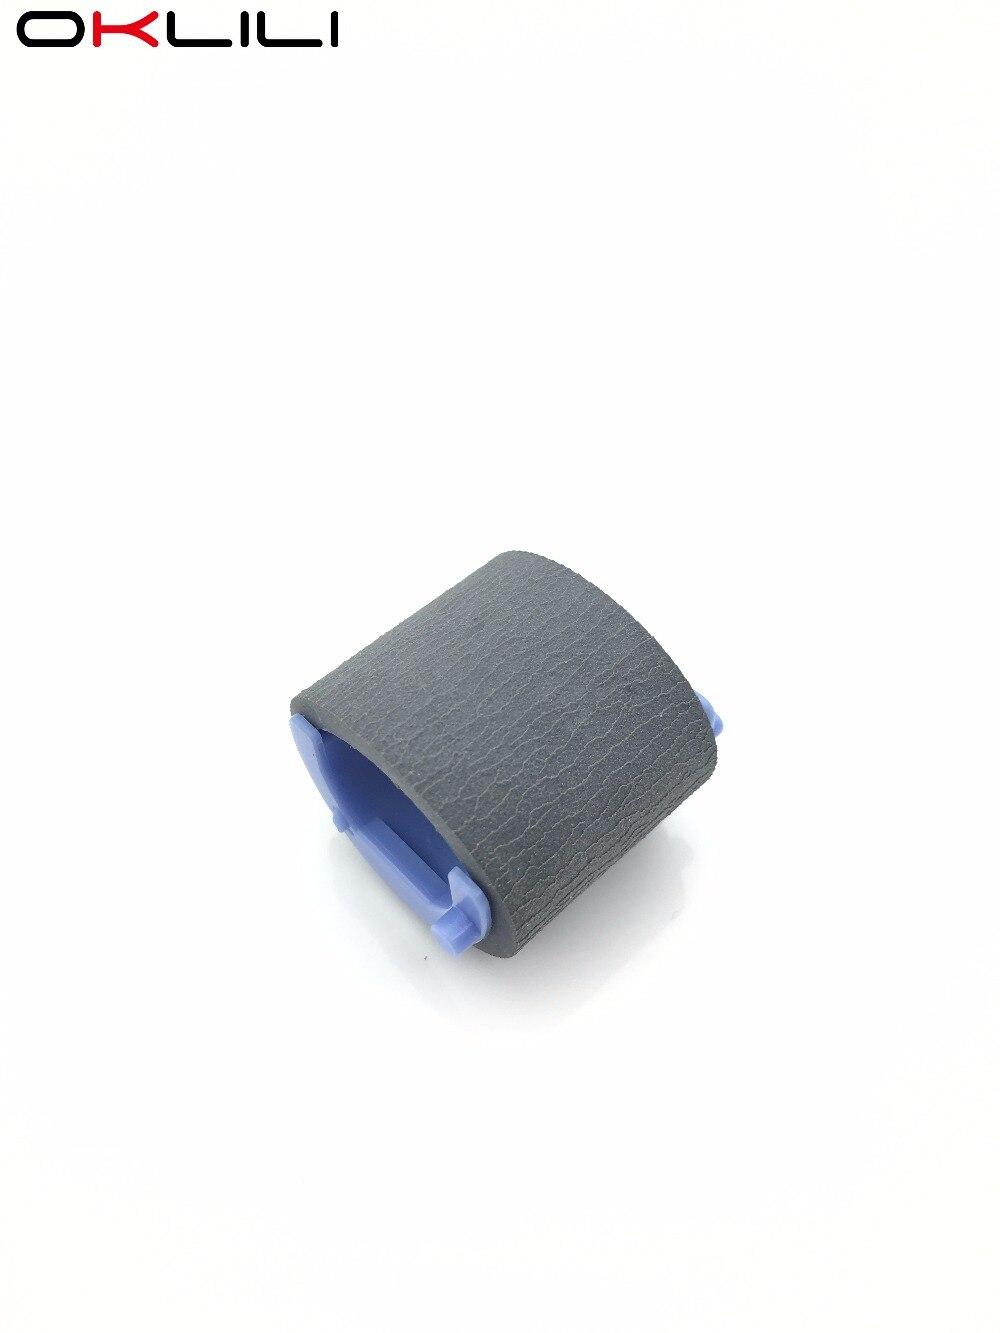 100X RL1 2593 000 Pickup Roller for HP P1102 P1106 P1108 P1606 M1130 M1132 M1136 M1210